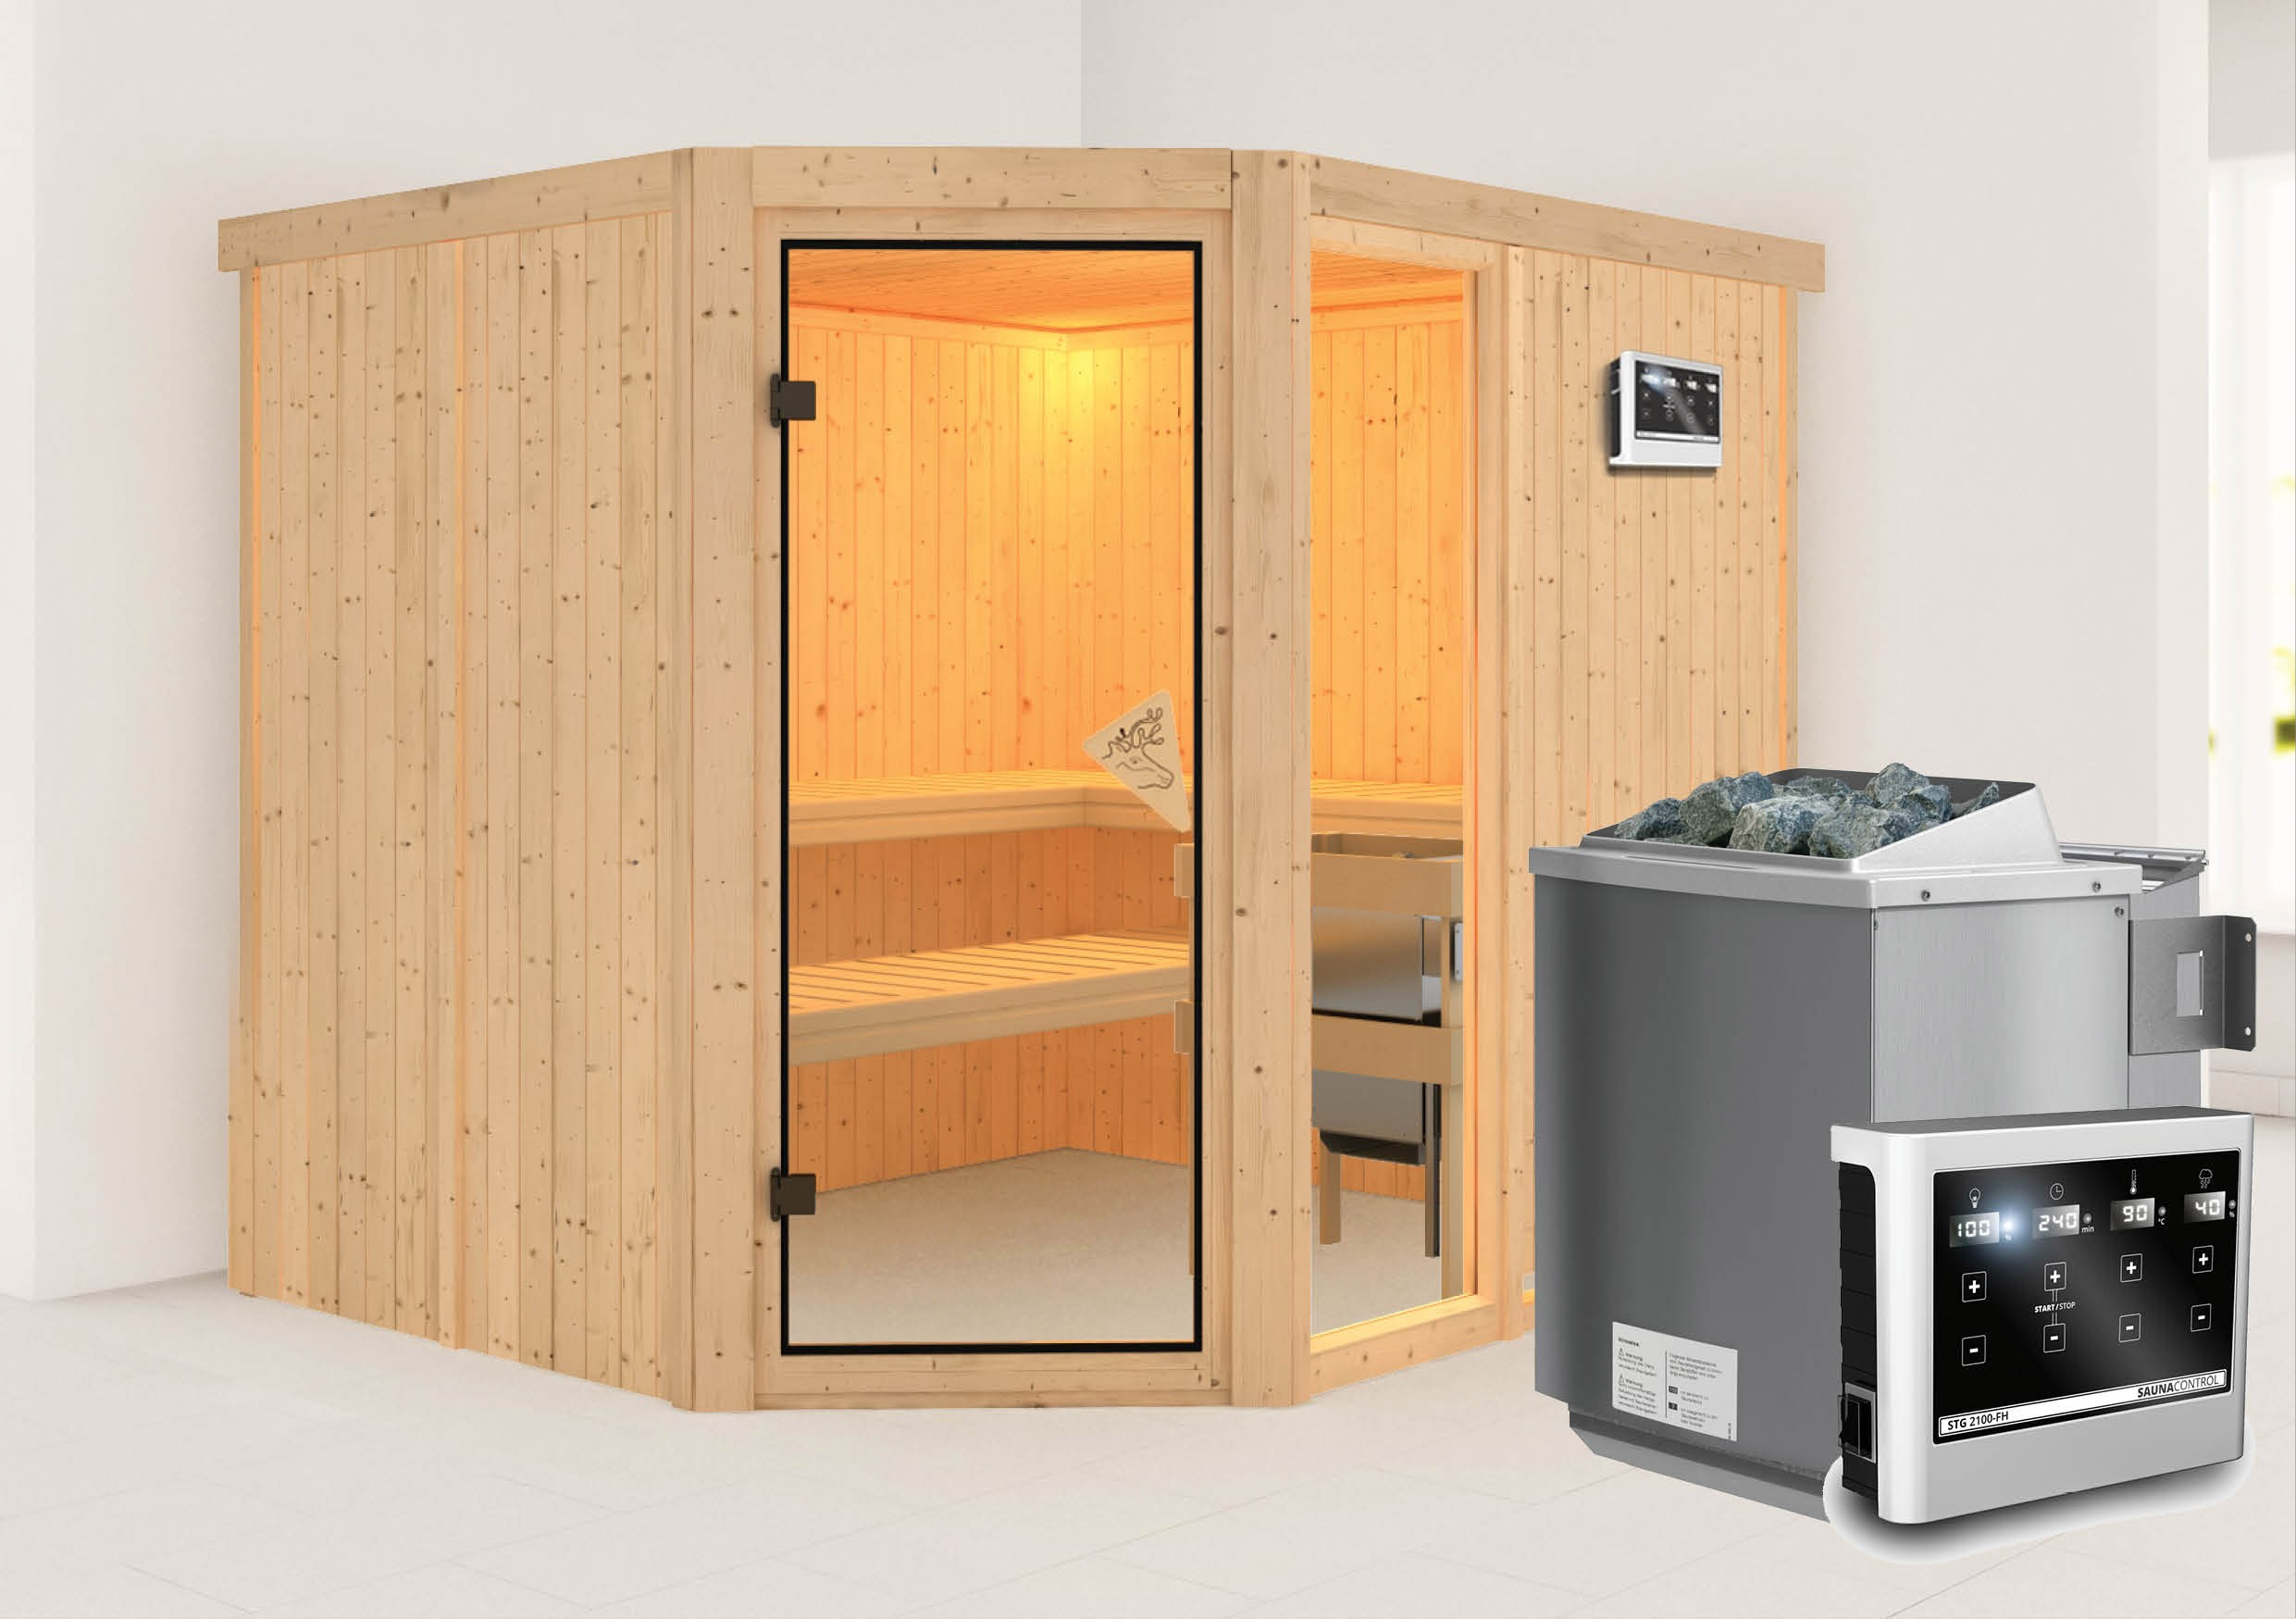 Karibu Sauna Fiona 3 68mm mit Bio Ofen 9kW extern classic Tür Bild 1